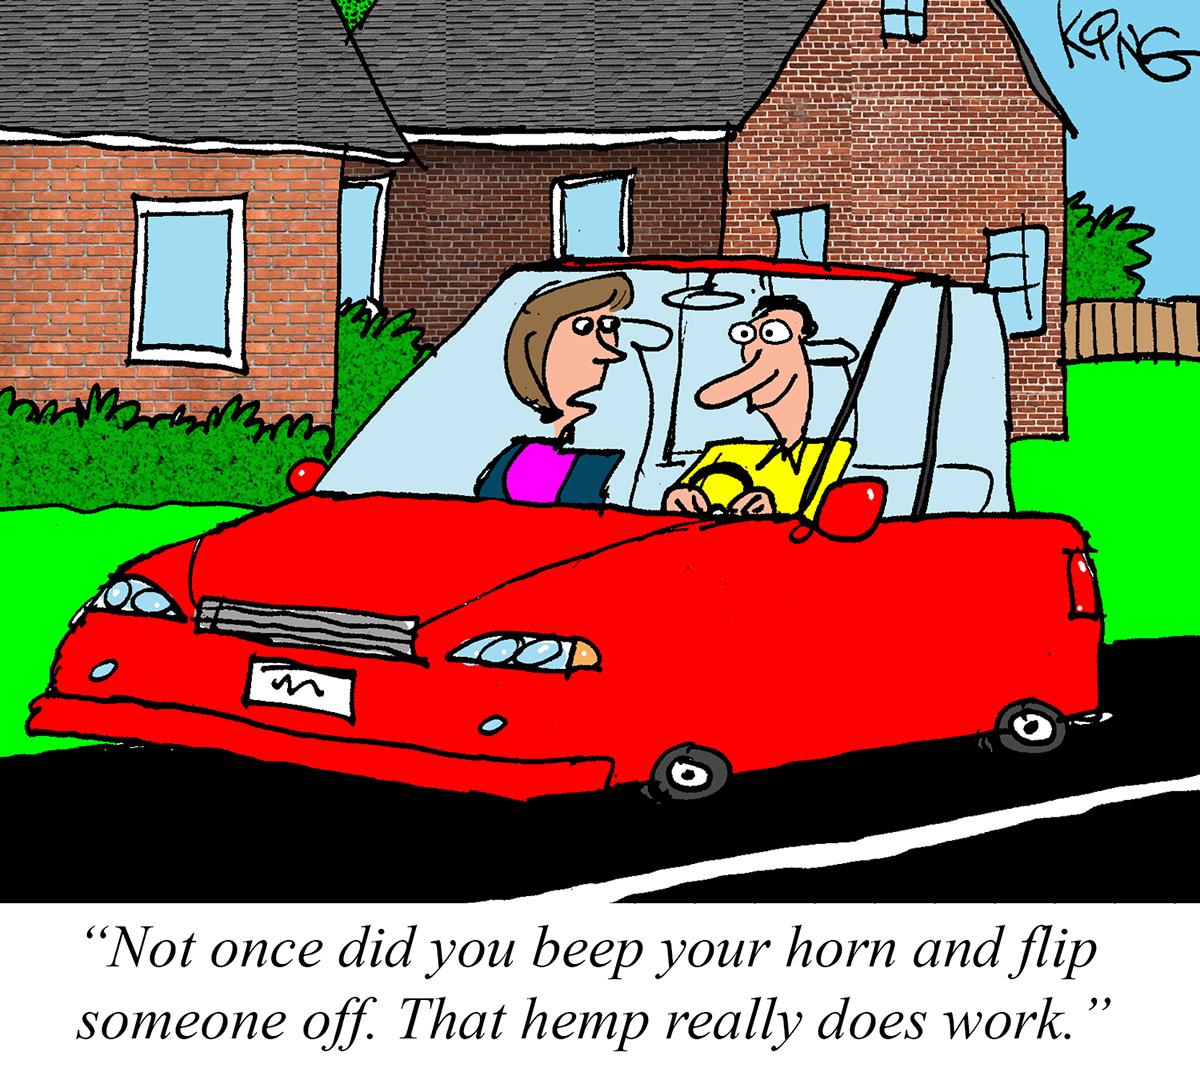 Jerry King-cartoonist-April 2021-hemp cartoon-CBD-CBDToday